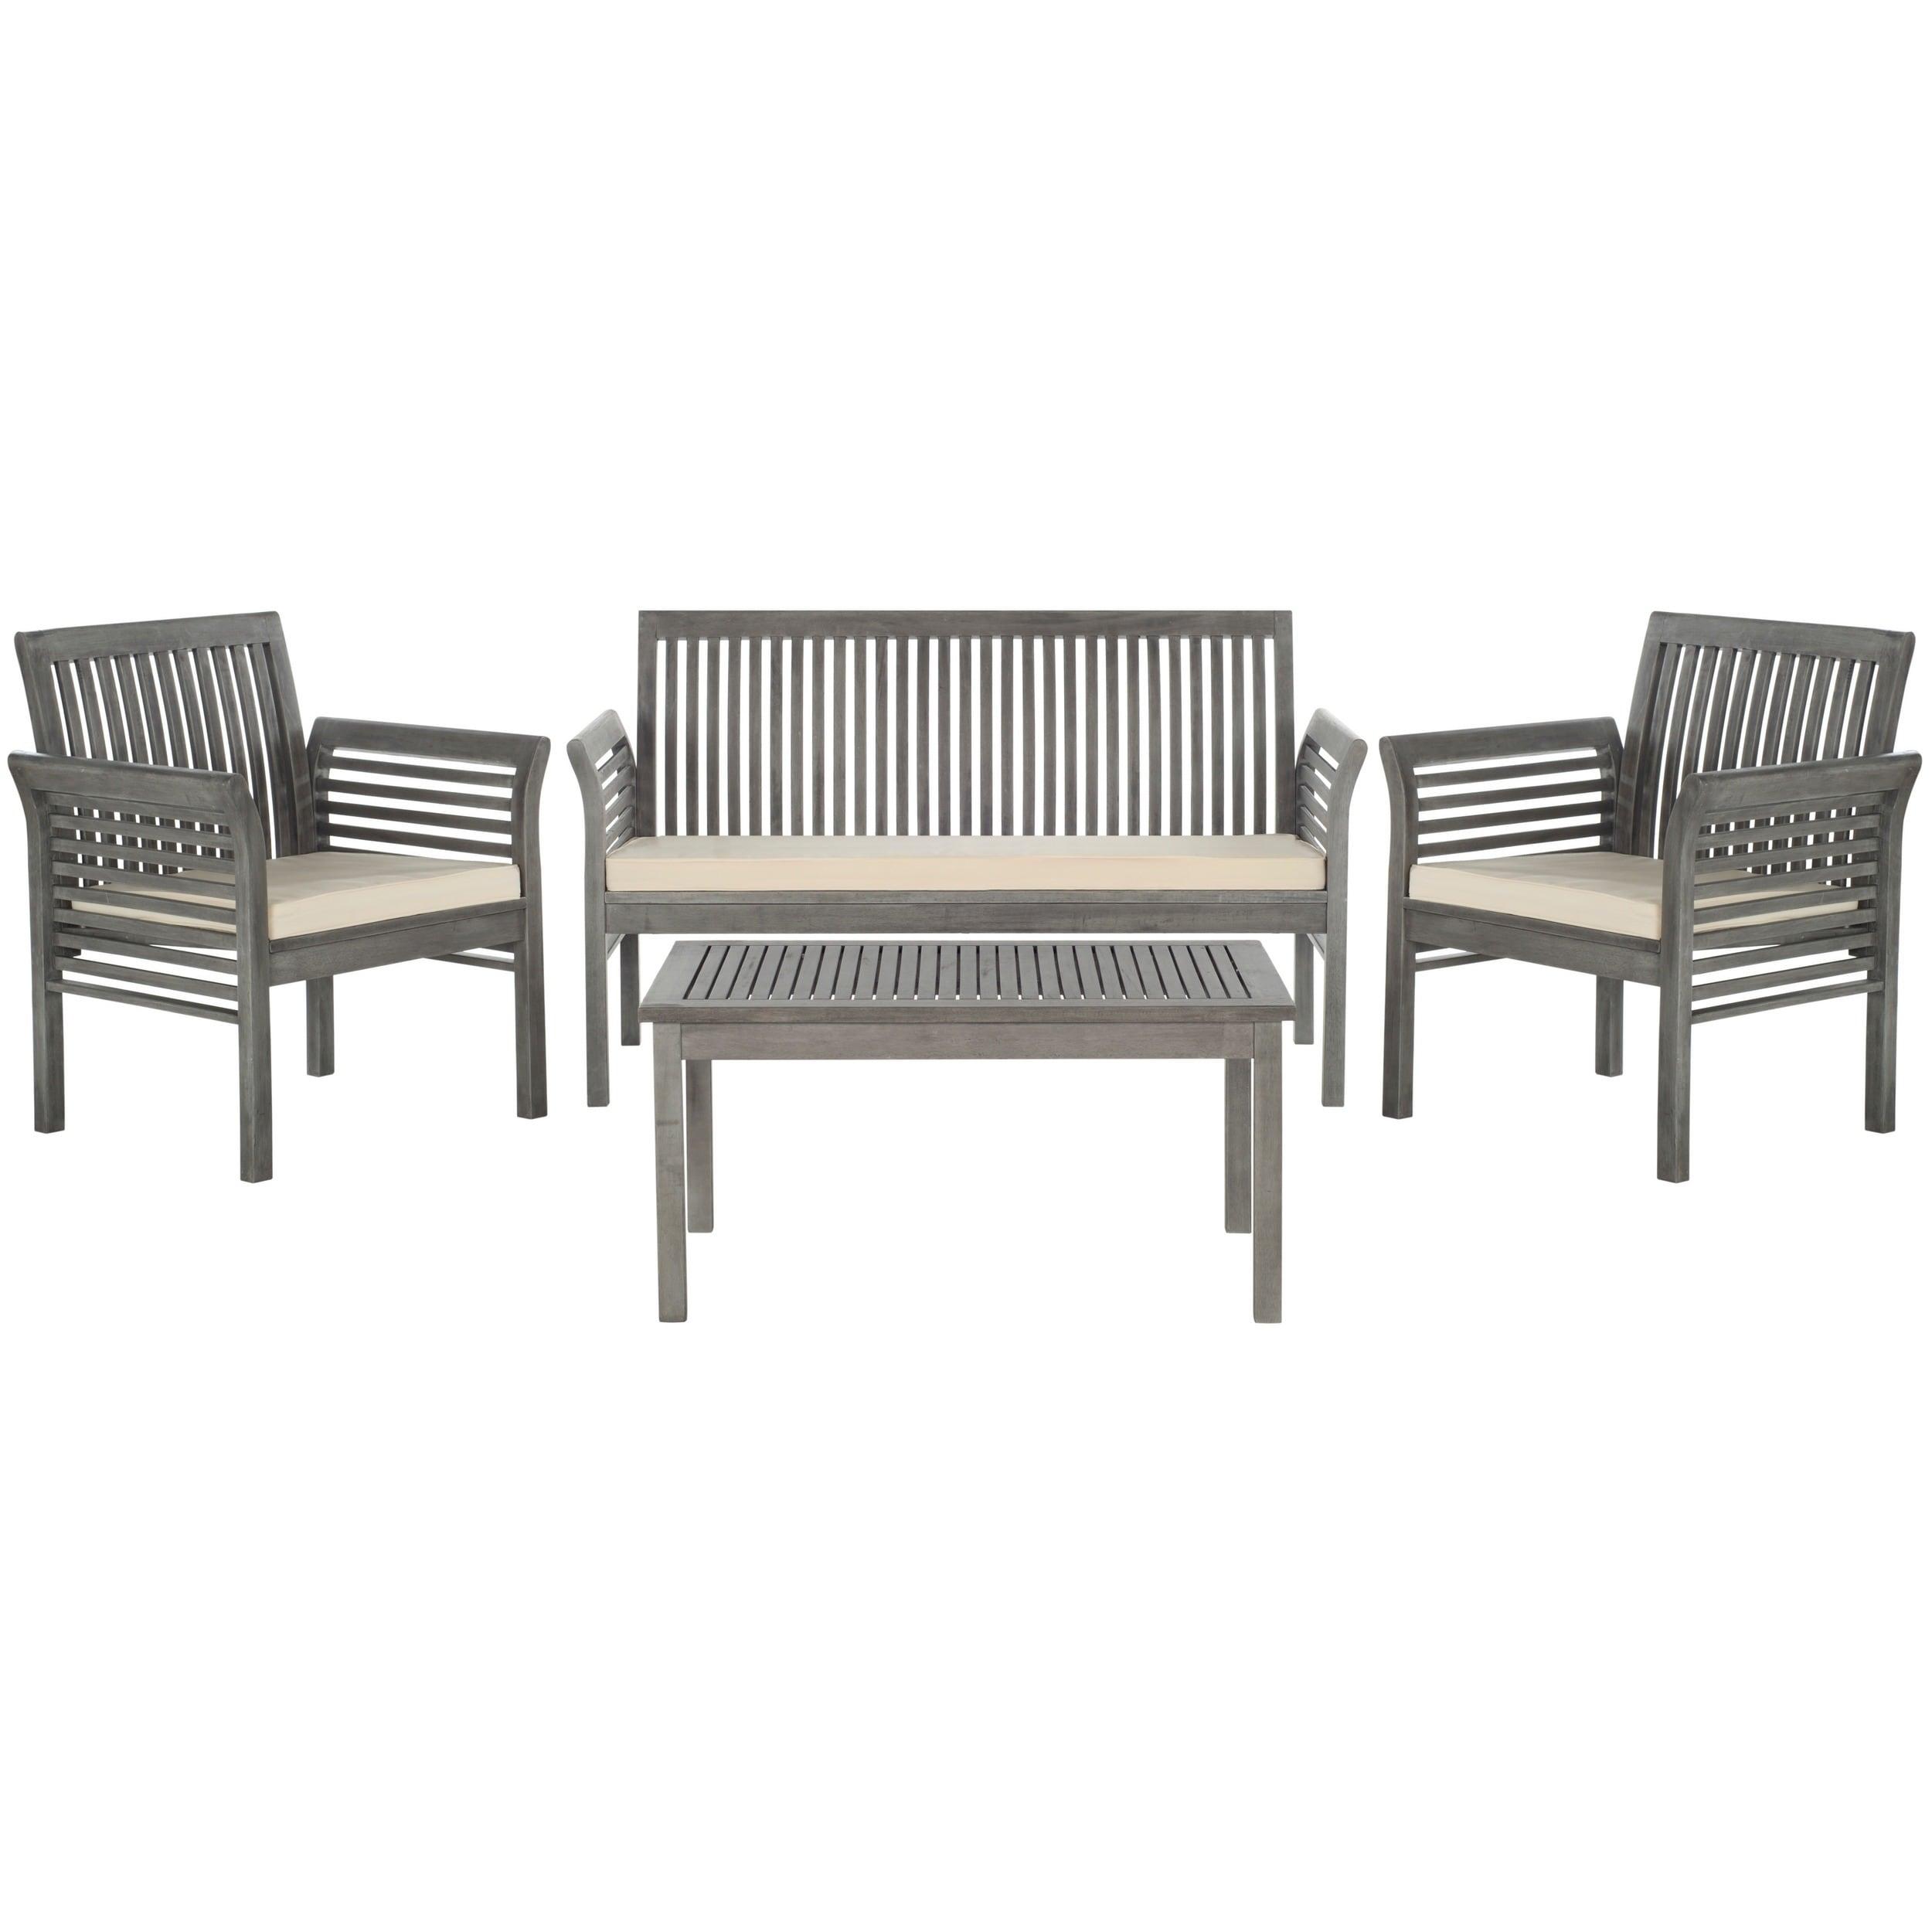 Safavieh Carson Grey Wash Acacia Wood 4 Piece Outdoor Furniture Set Free Shipping Today 16207347